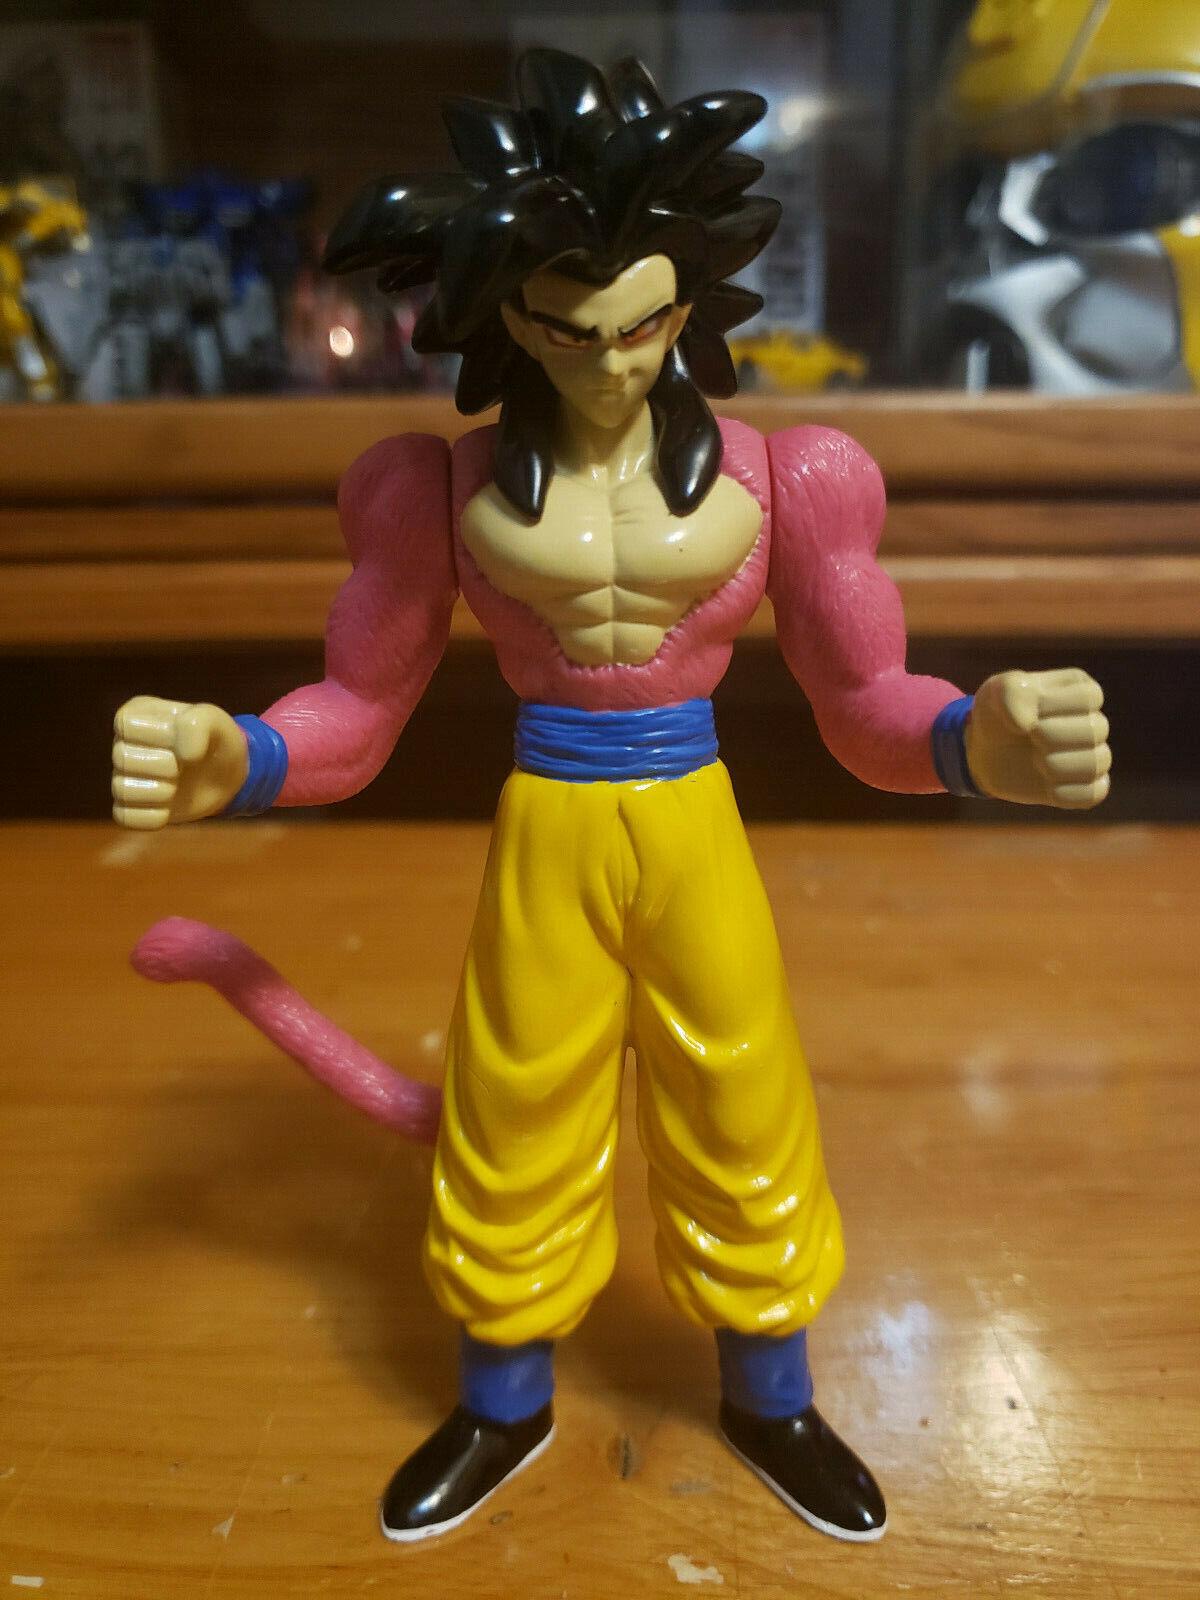 Character:GT Super Saiyan 4 Goku Vol 38:BANDAI Dragonball Z  and Dragon Ball GT super battle collection AB Toys & Irwin